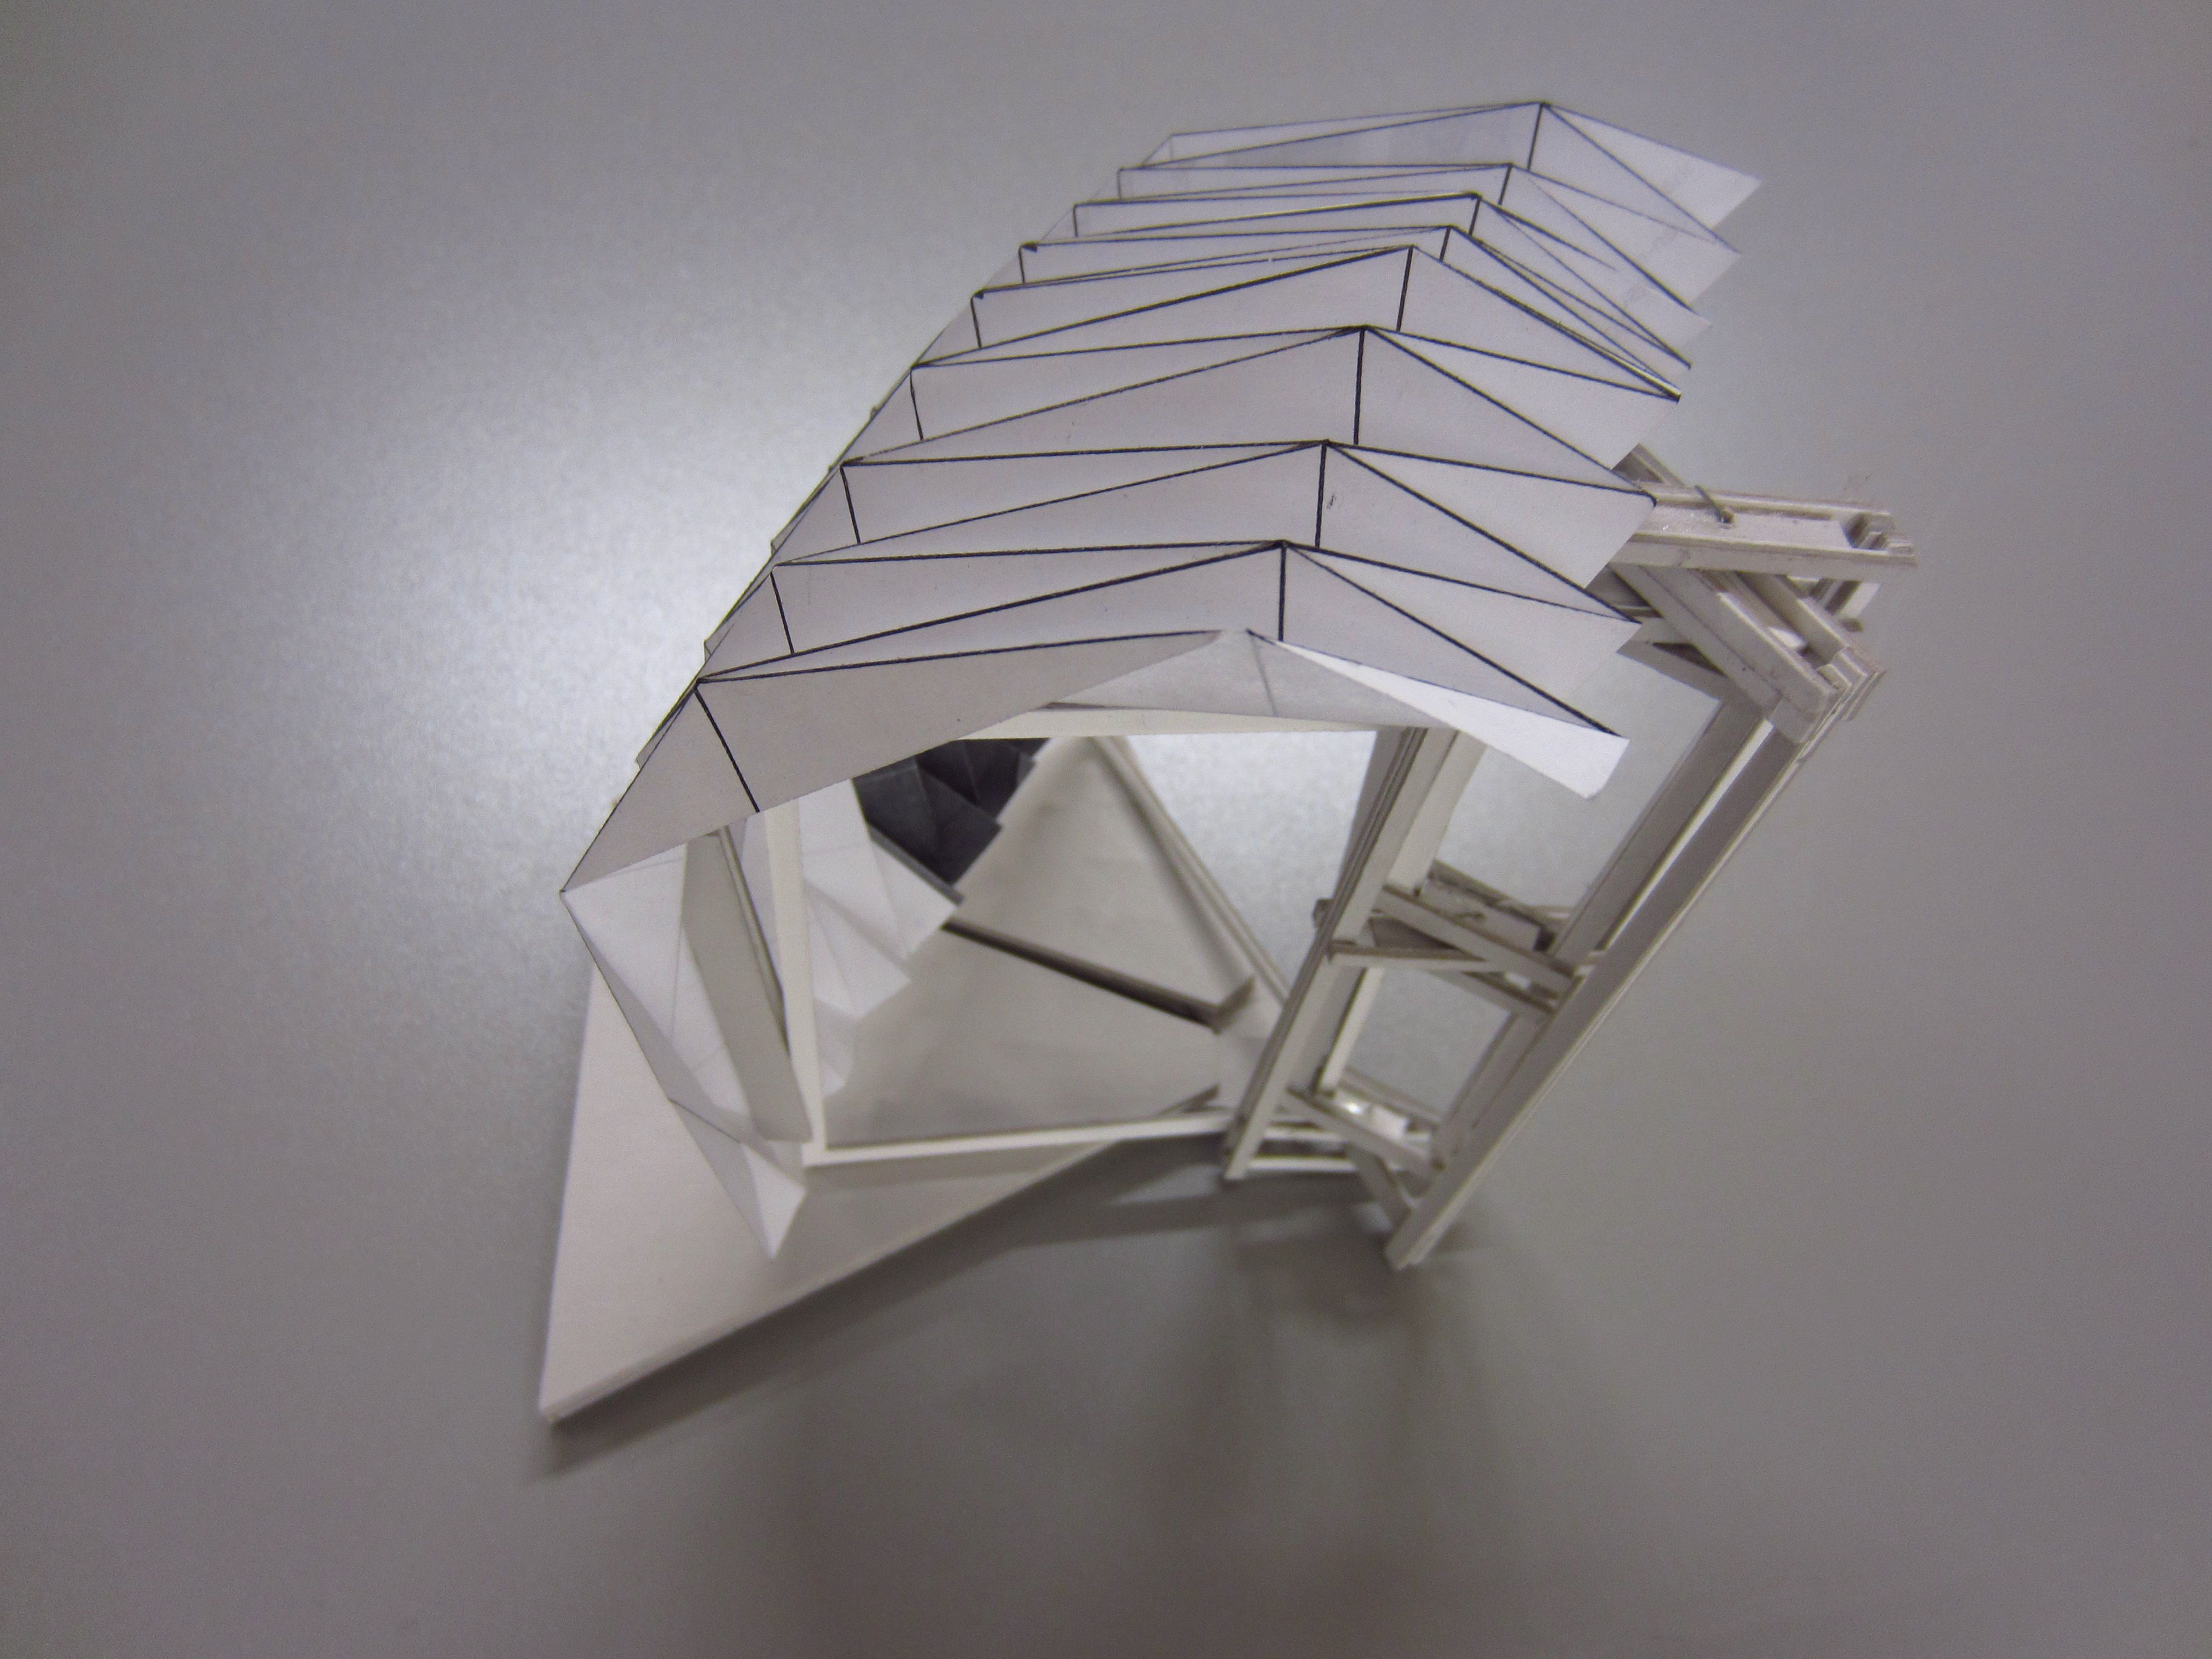 Origami Architecture Design